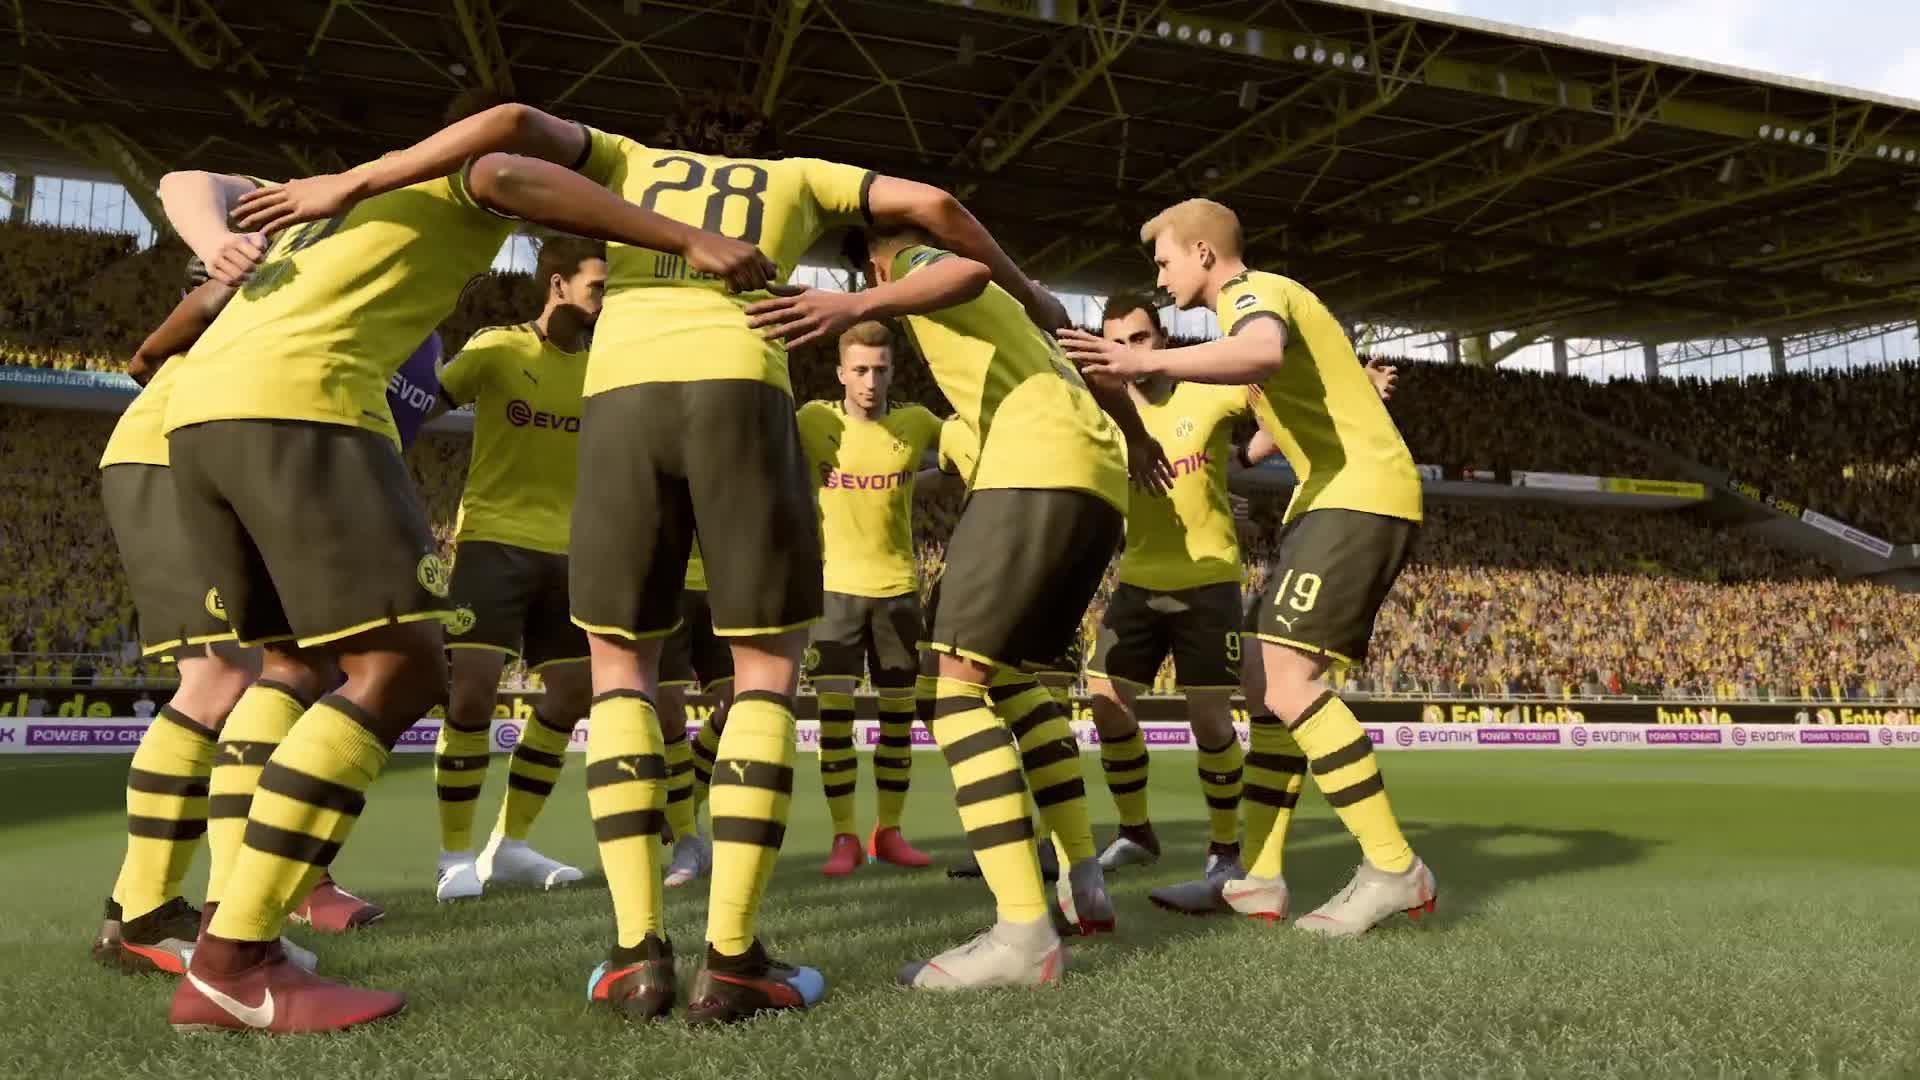 Electronic Arts, Ea, Gamescom, Fußball, Fifa, Bundesliga, gamescom 2019, Fifa 20